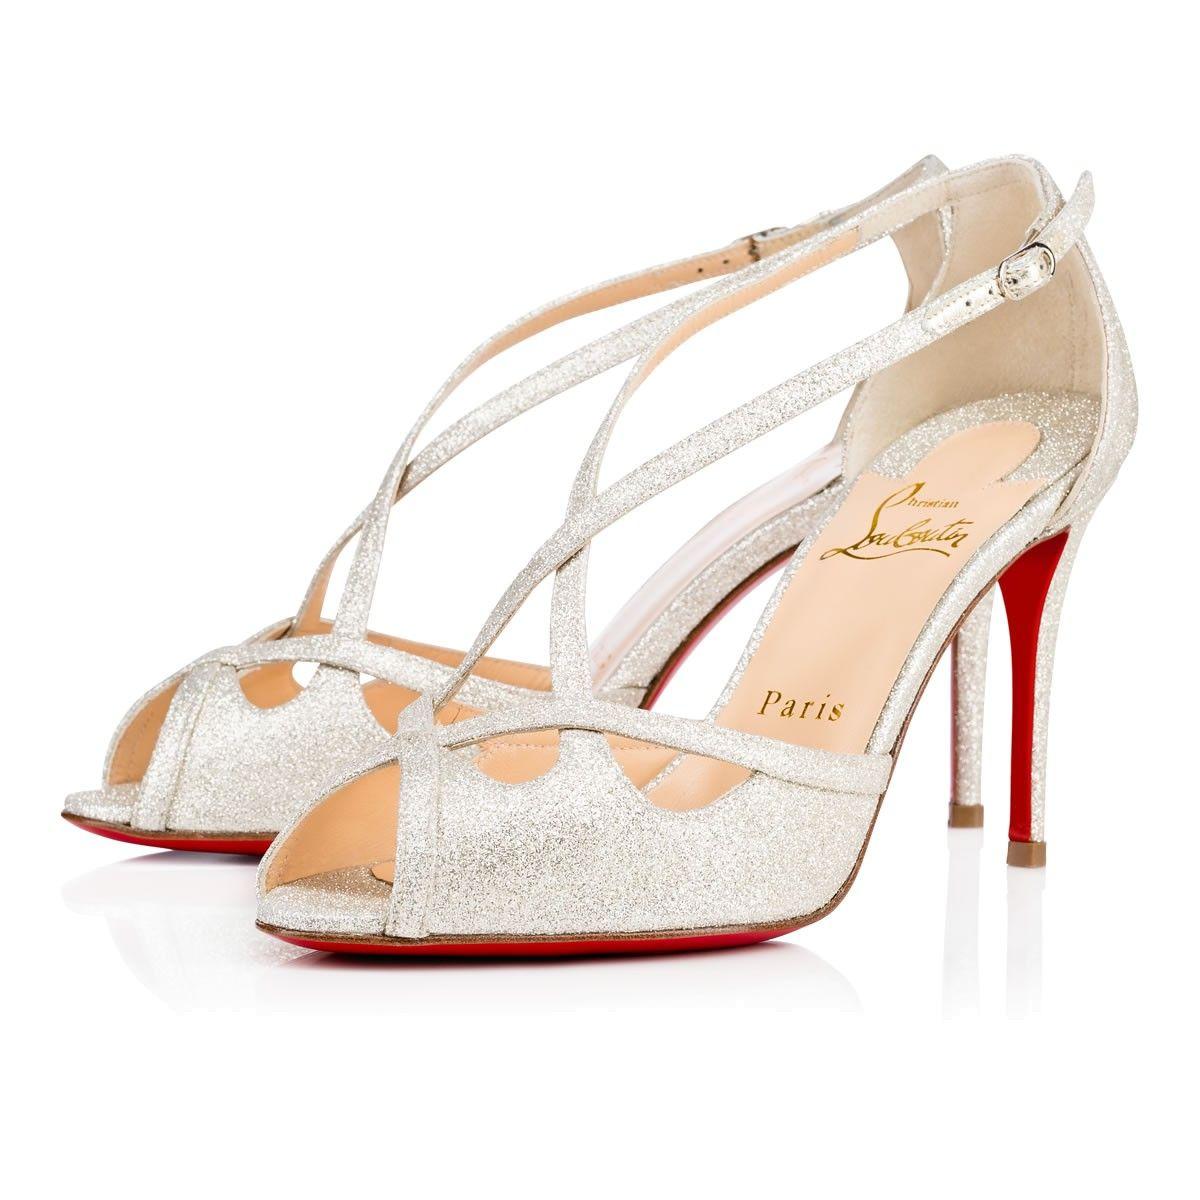 christian louboutin wedding shoes online